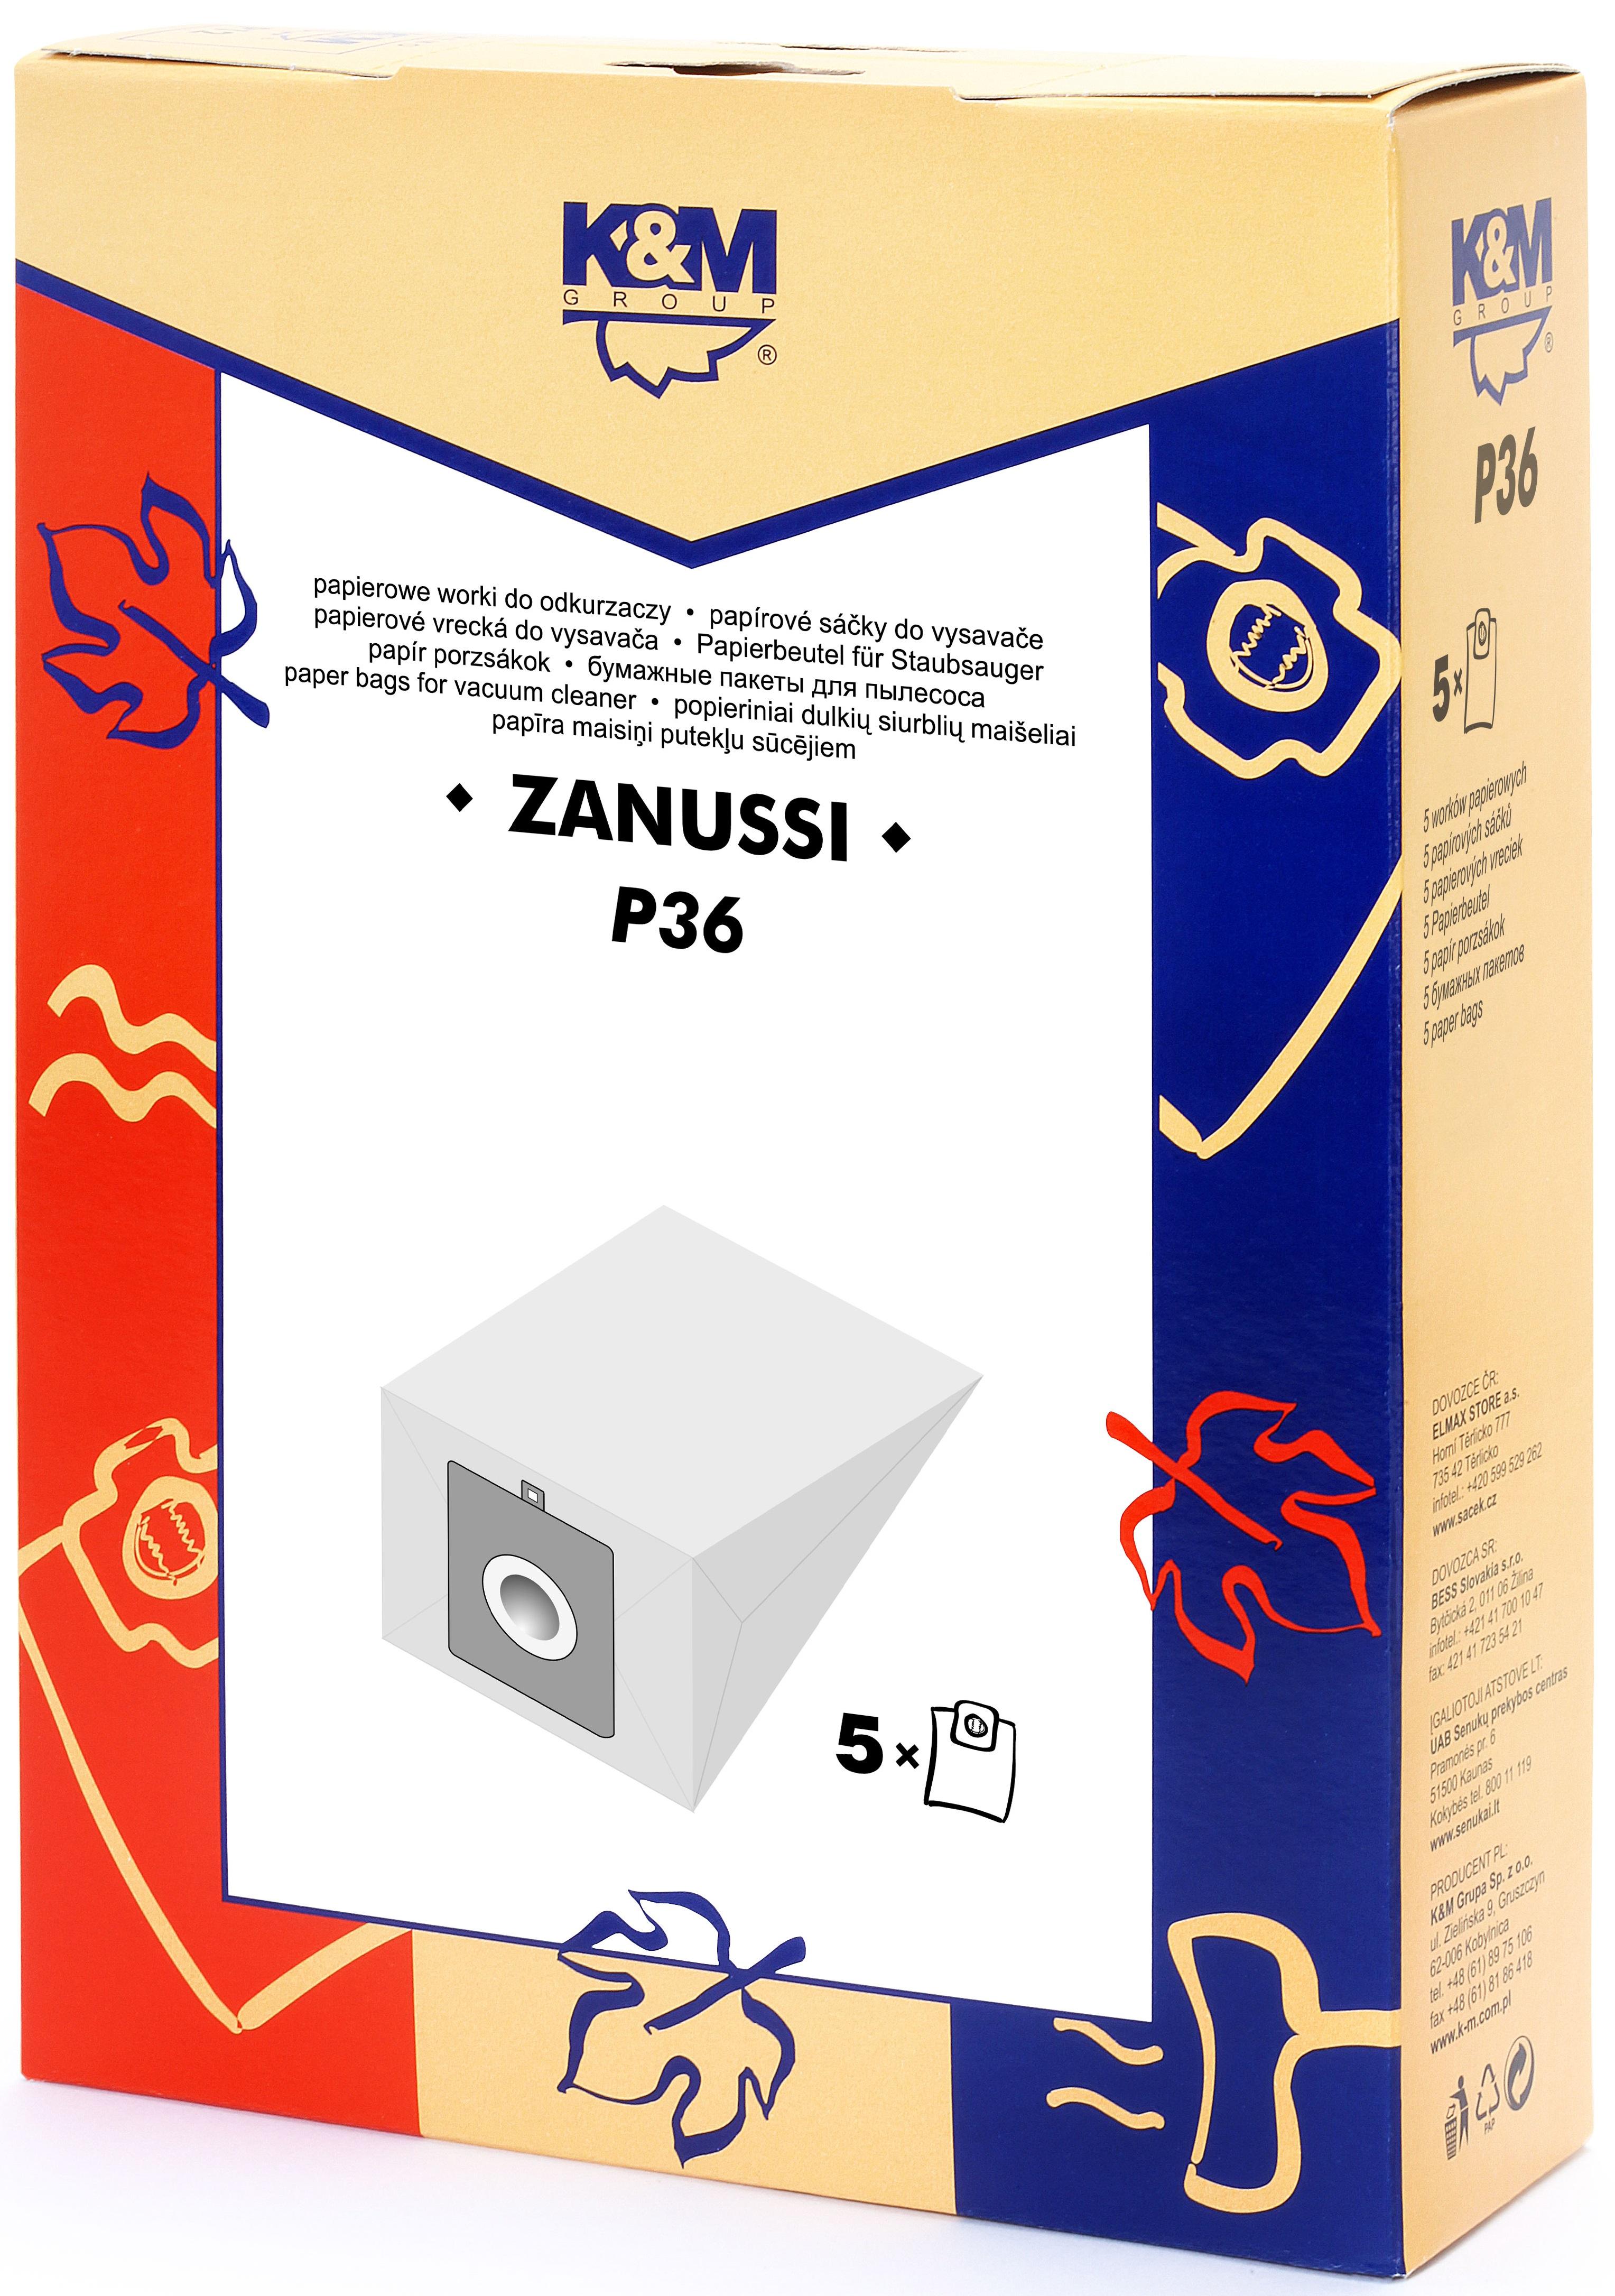 Sac aspirator Zanussi 3321, 3341, hartie, 5X saci, K&M [0]